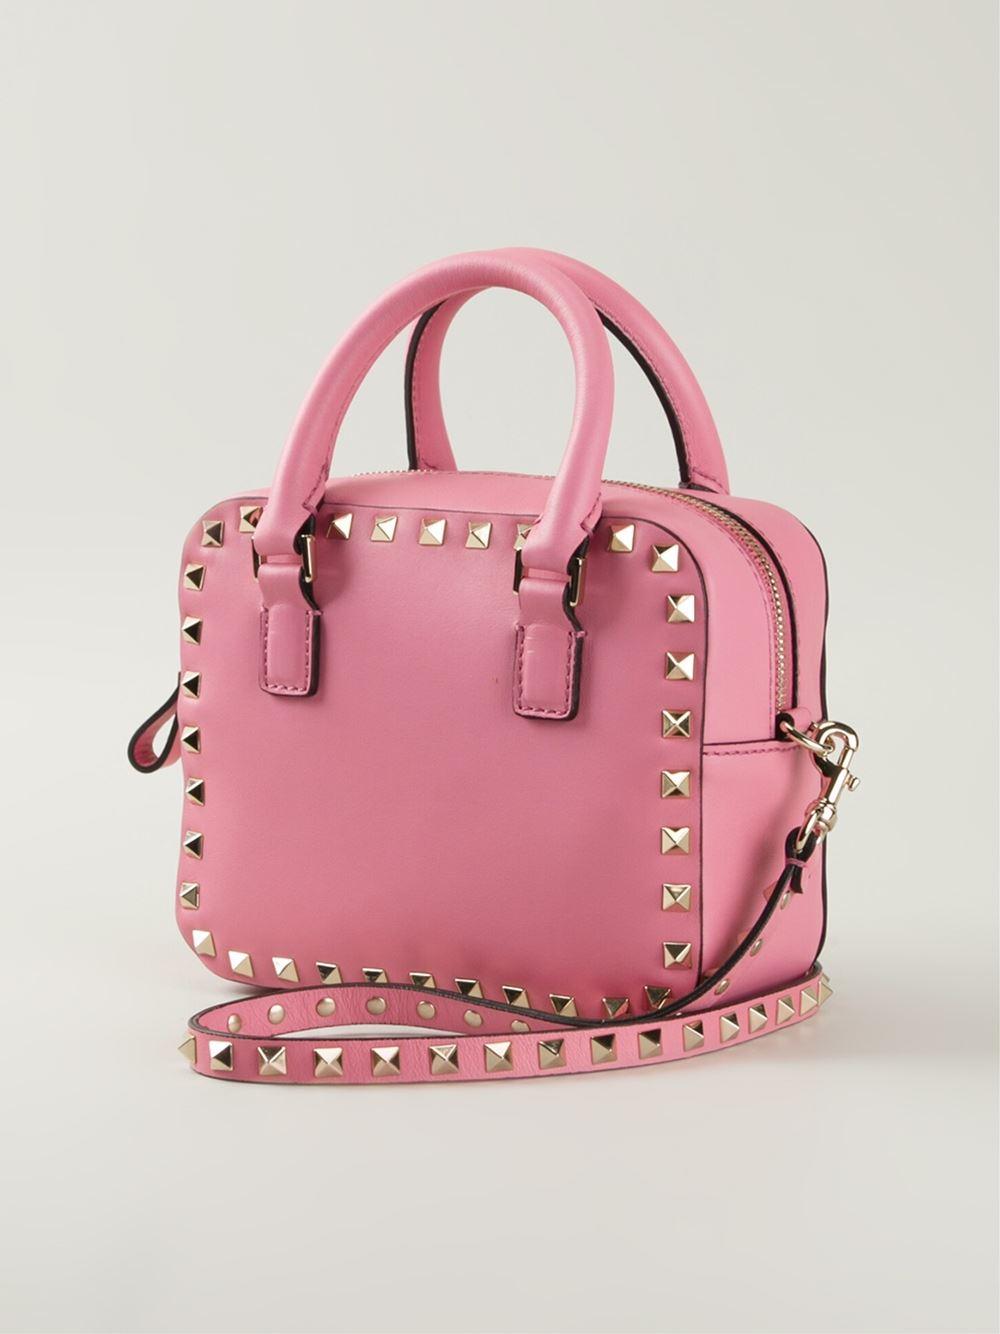 valentino rockstud crossbody bag in pink pink purple